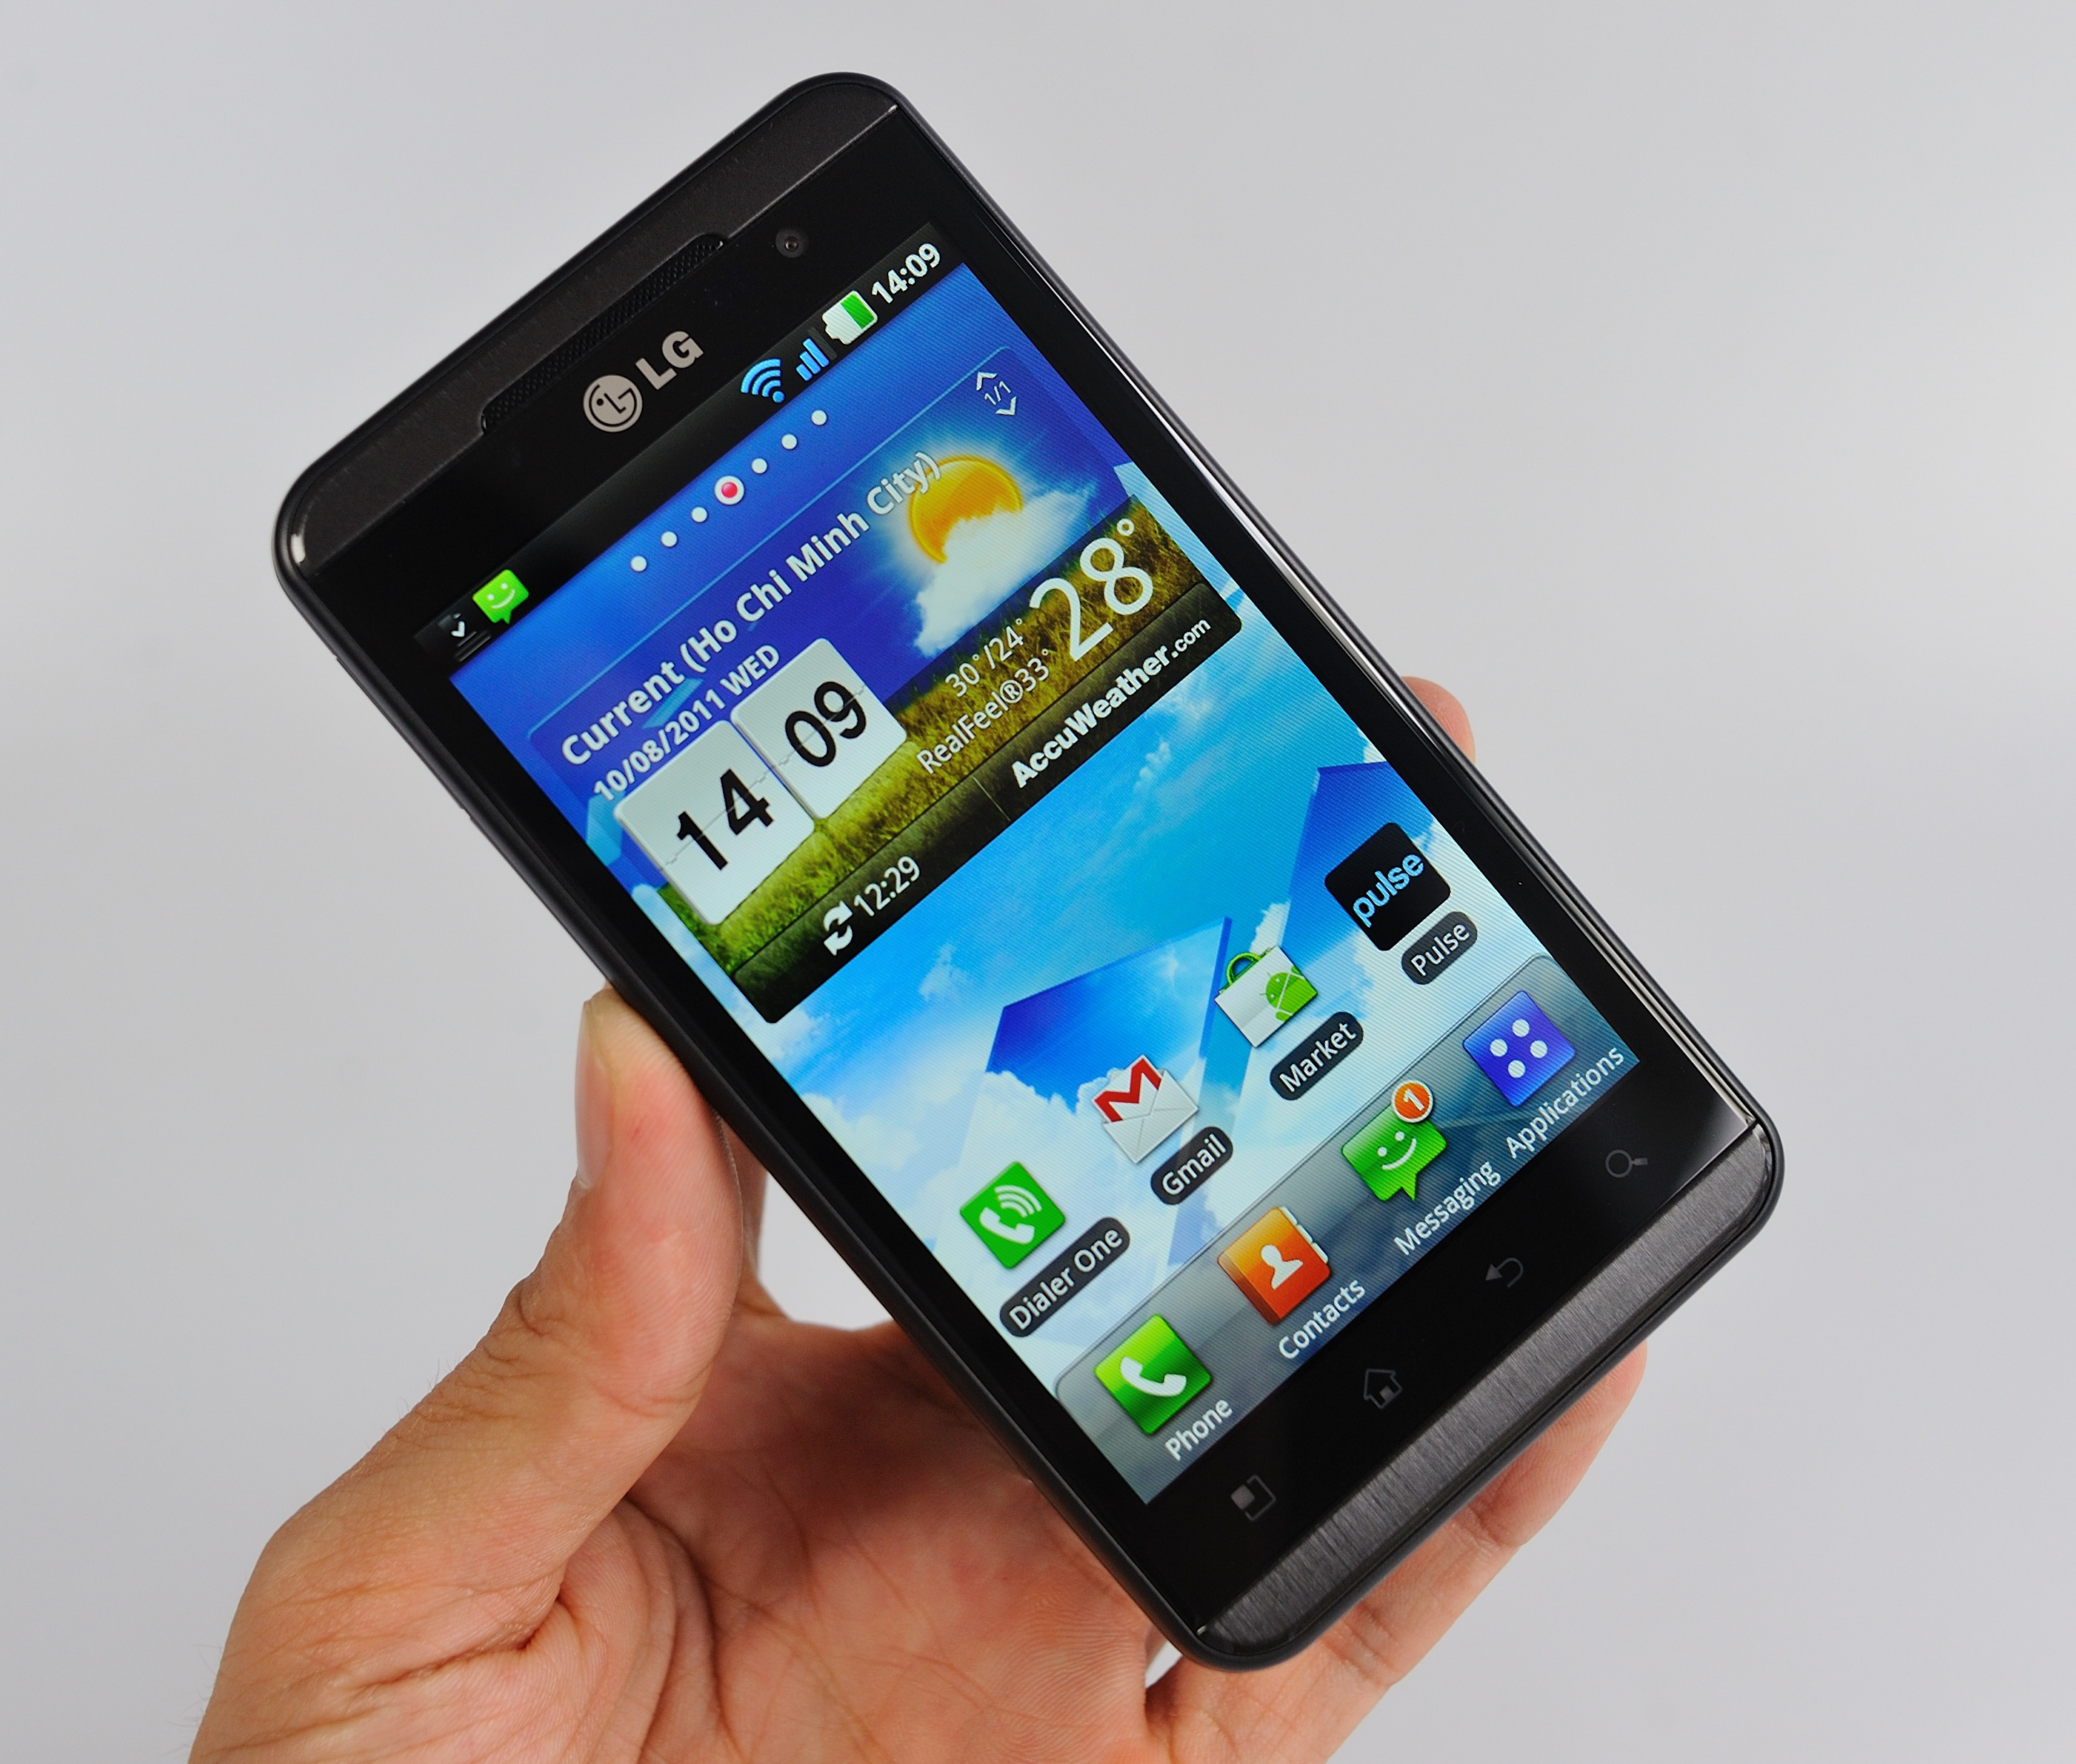 LG_Optimus_3D_Tinhte21.jpg